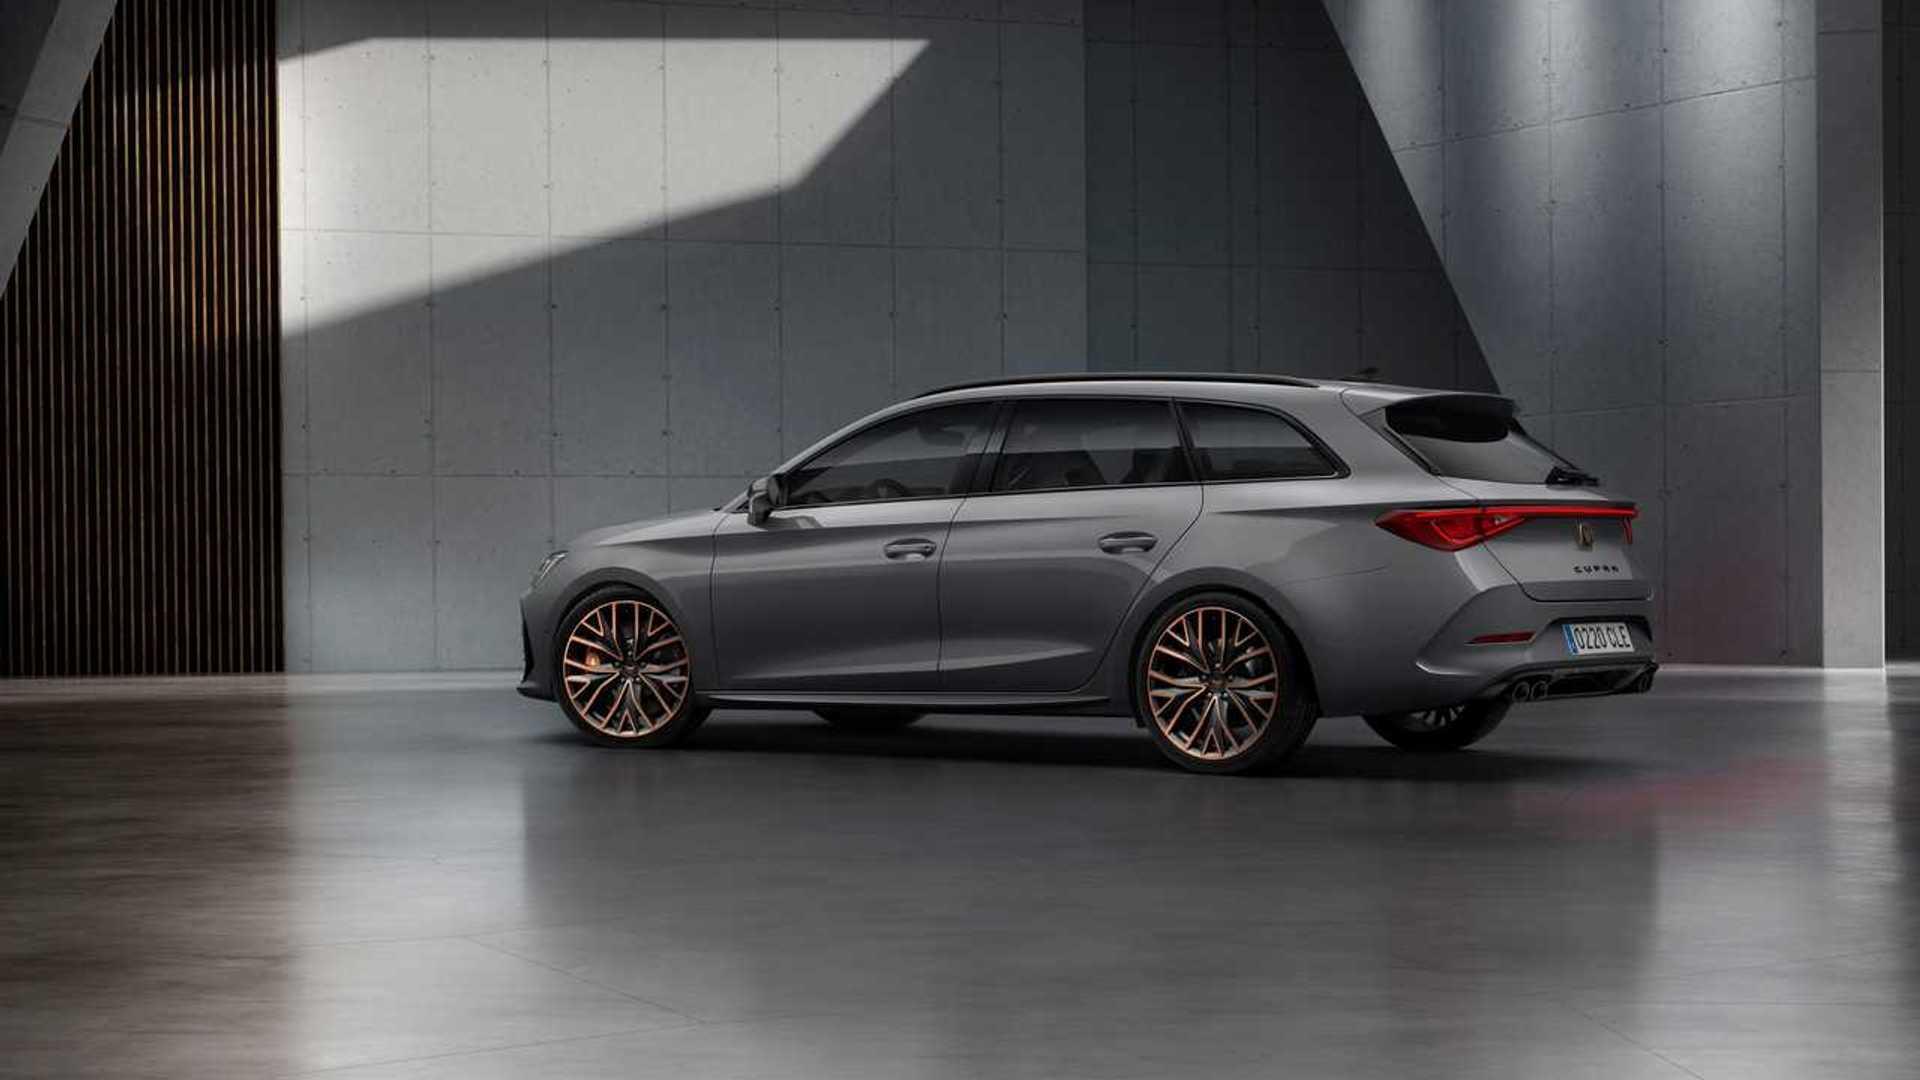 2021 Cupra Leon Revealed: 306-HP AWD Wagon, PHEV Model, No ...